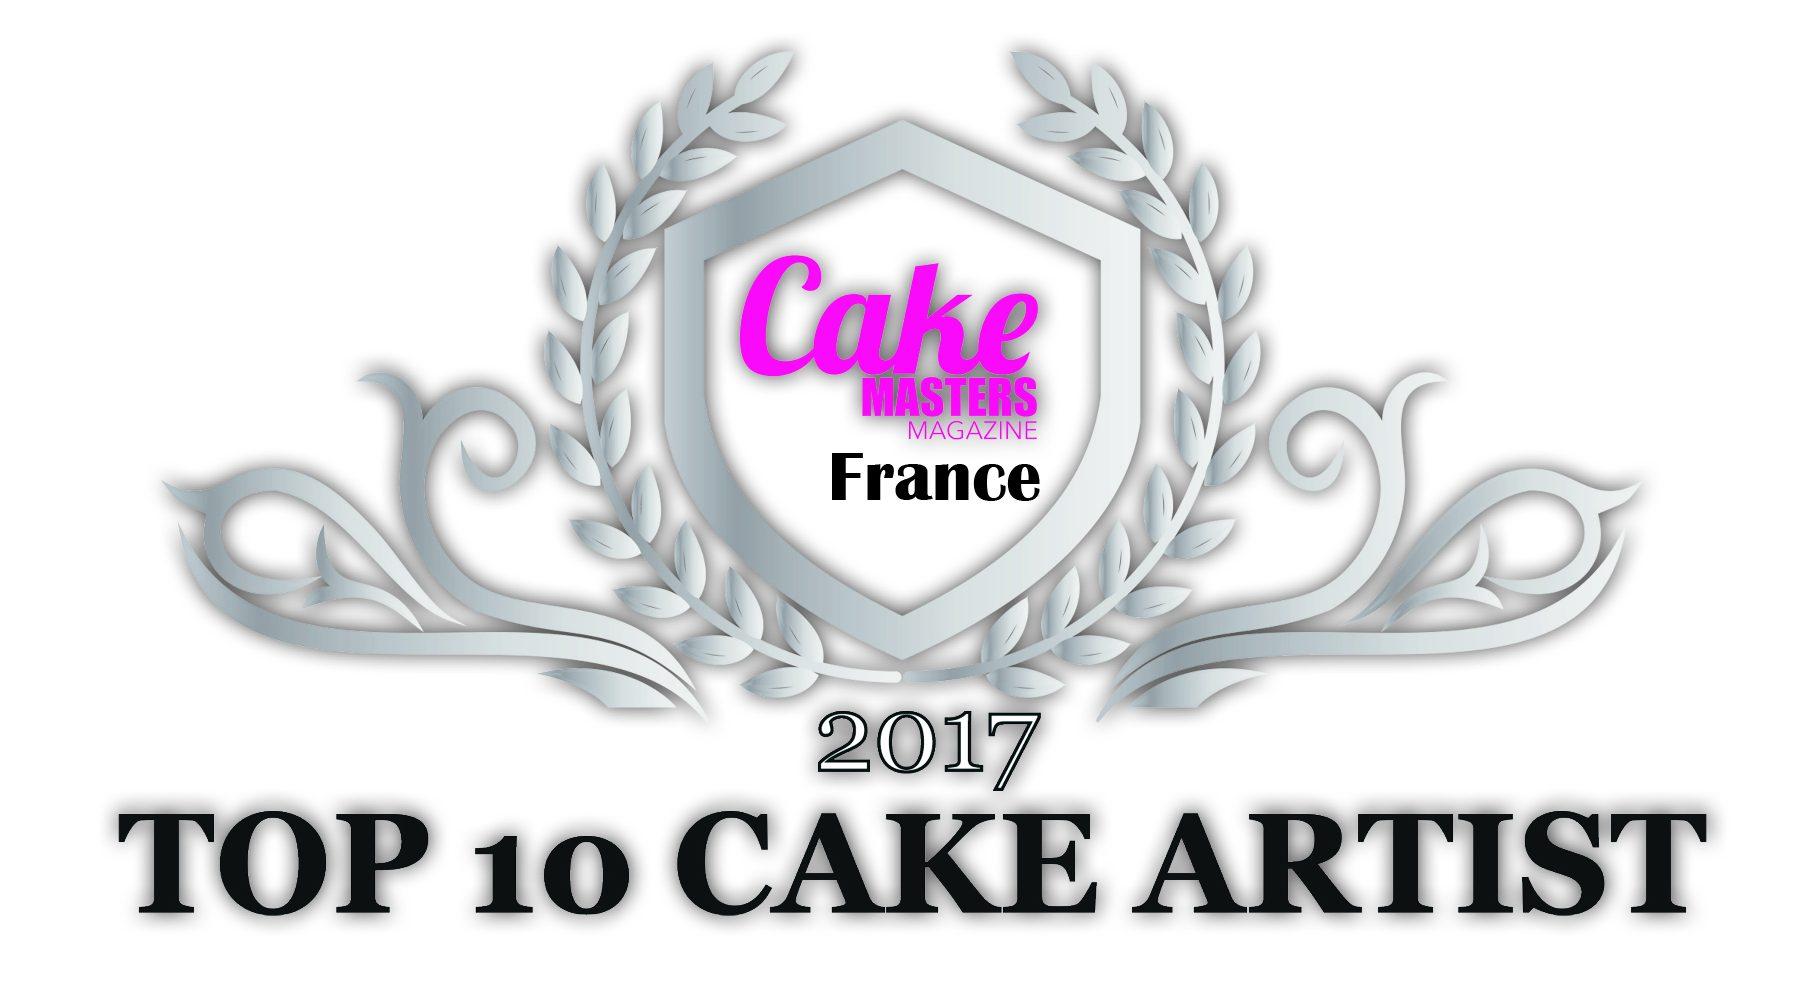 Cake Masters Magazine France – 2017 Top 10 Cake Artist